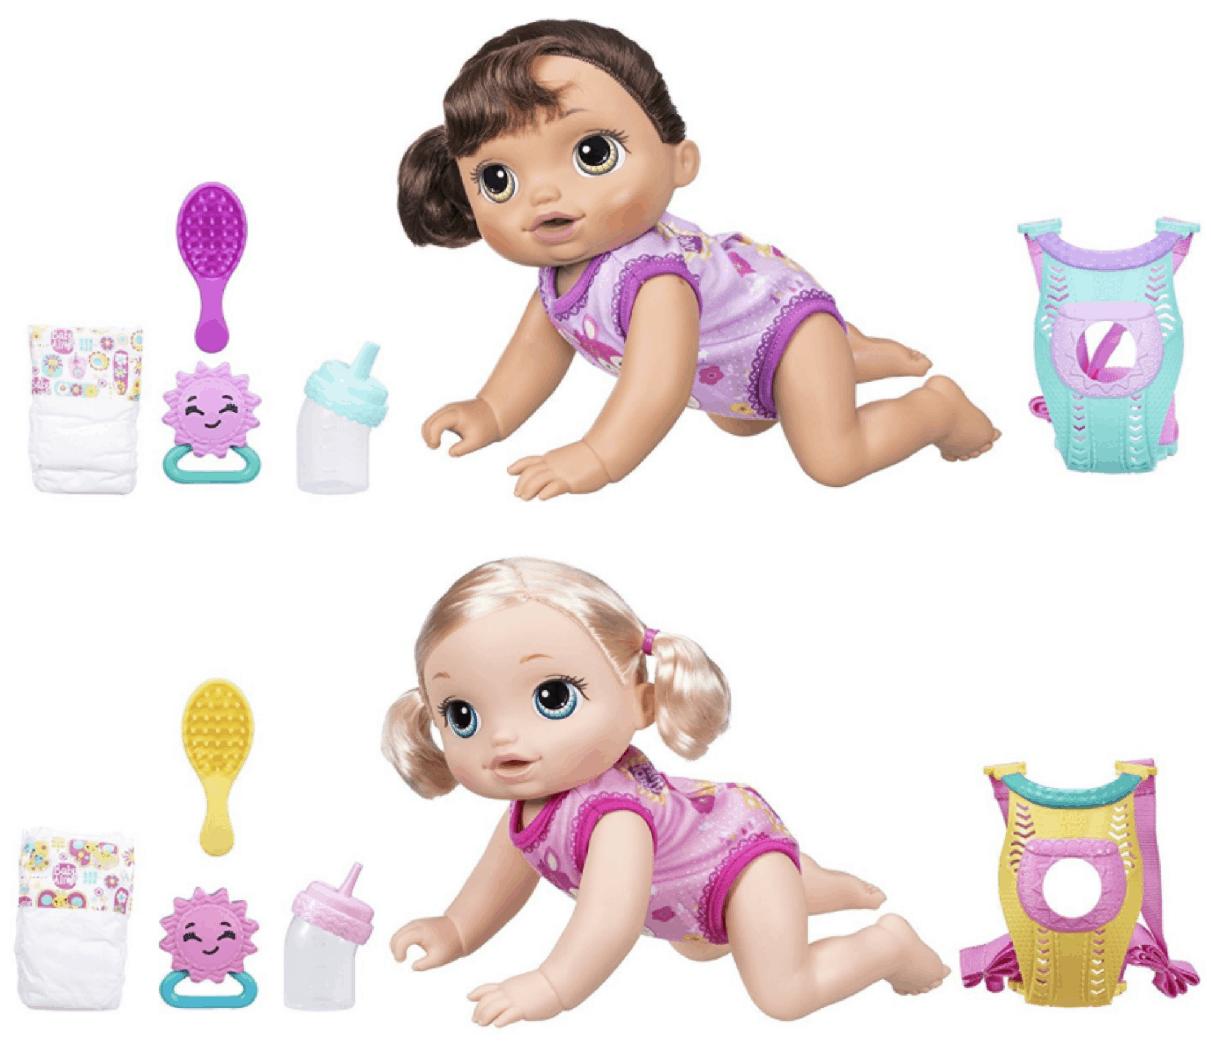 Baby Alive Baby Go Bye Bye Doll 29 59 Lowest Price